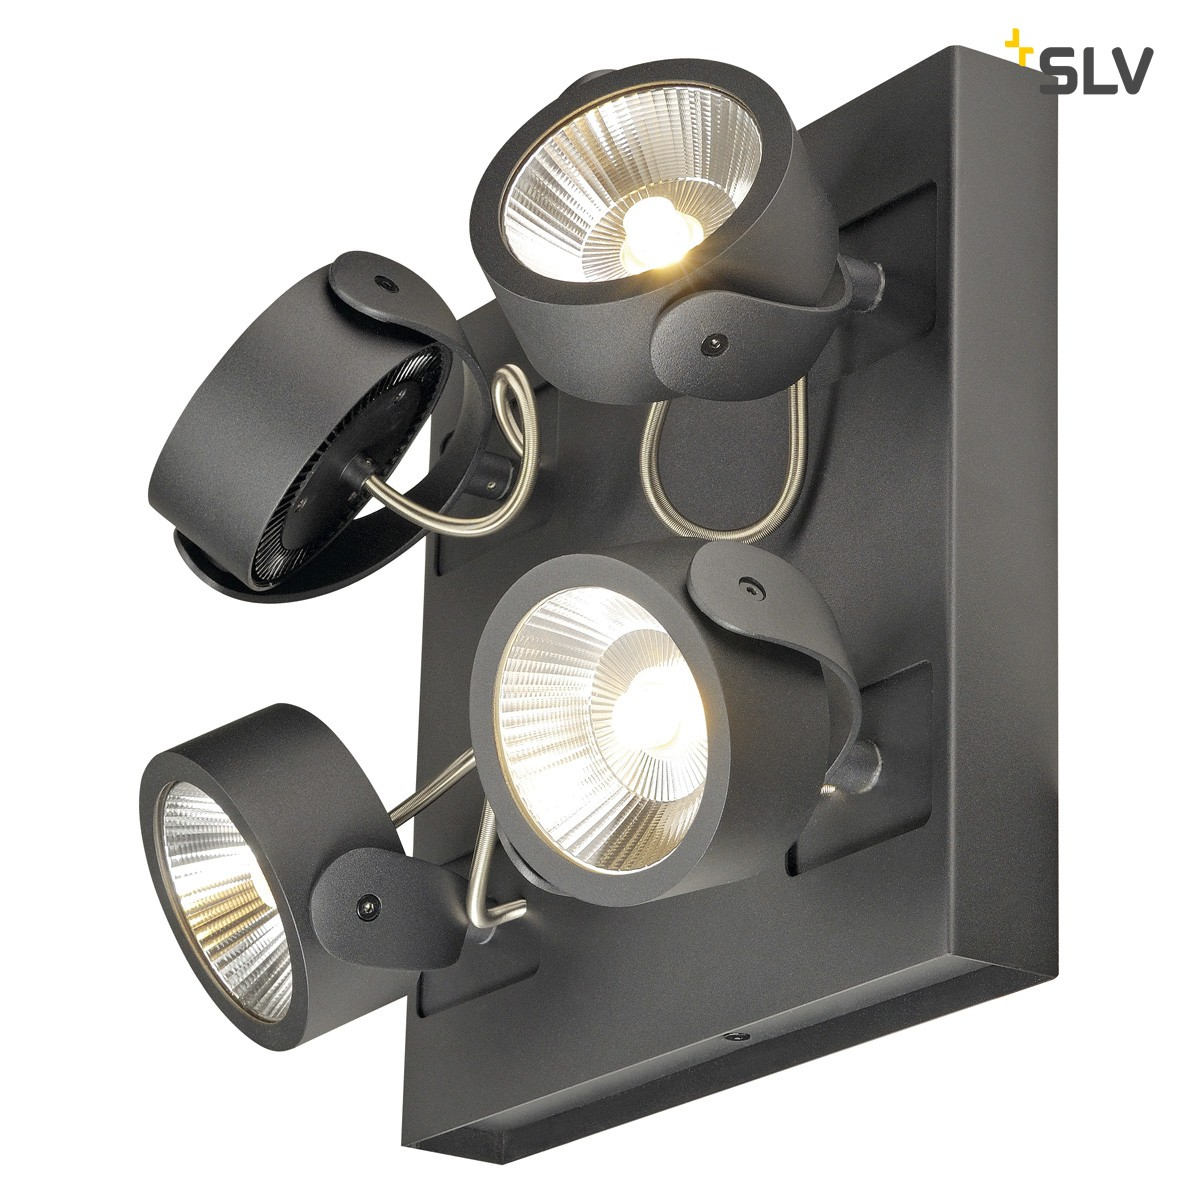 SLV Kalu LED Wand- / Deckenleuchte Square, 4-flg. 60°, schwarz